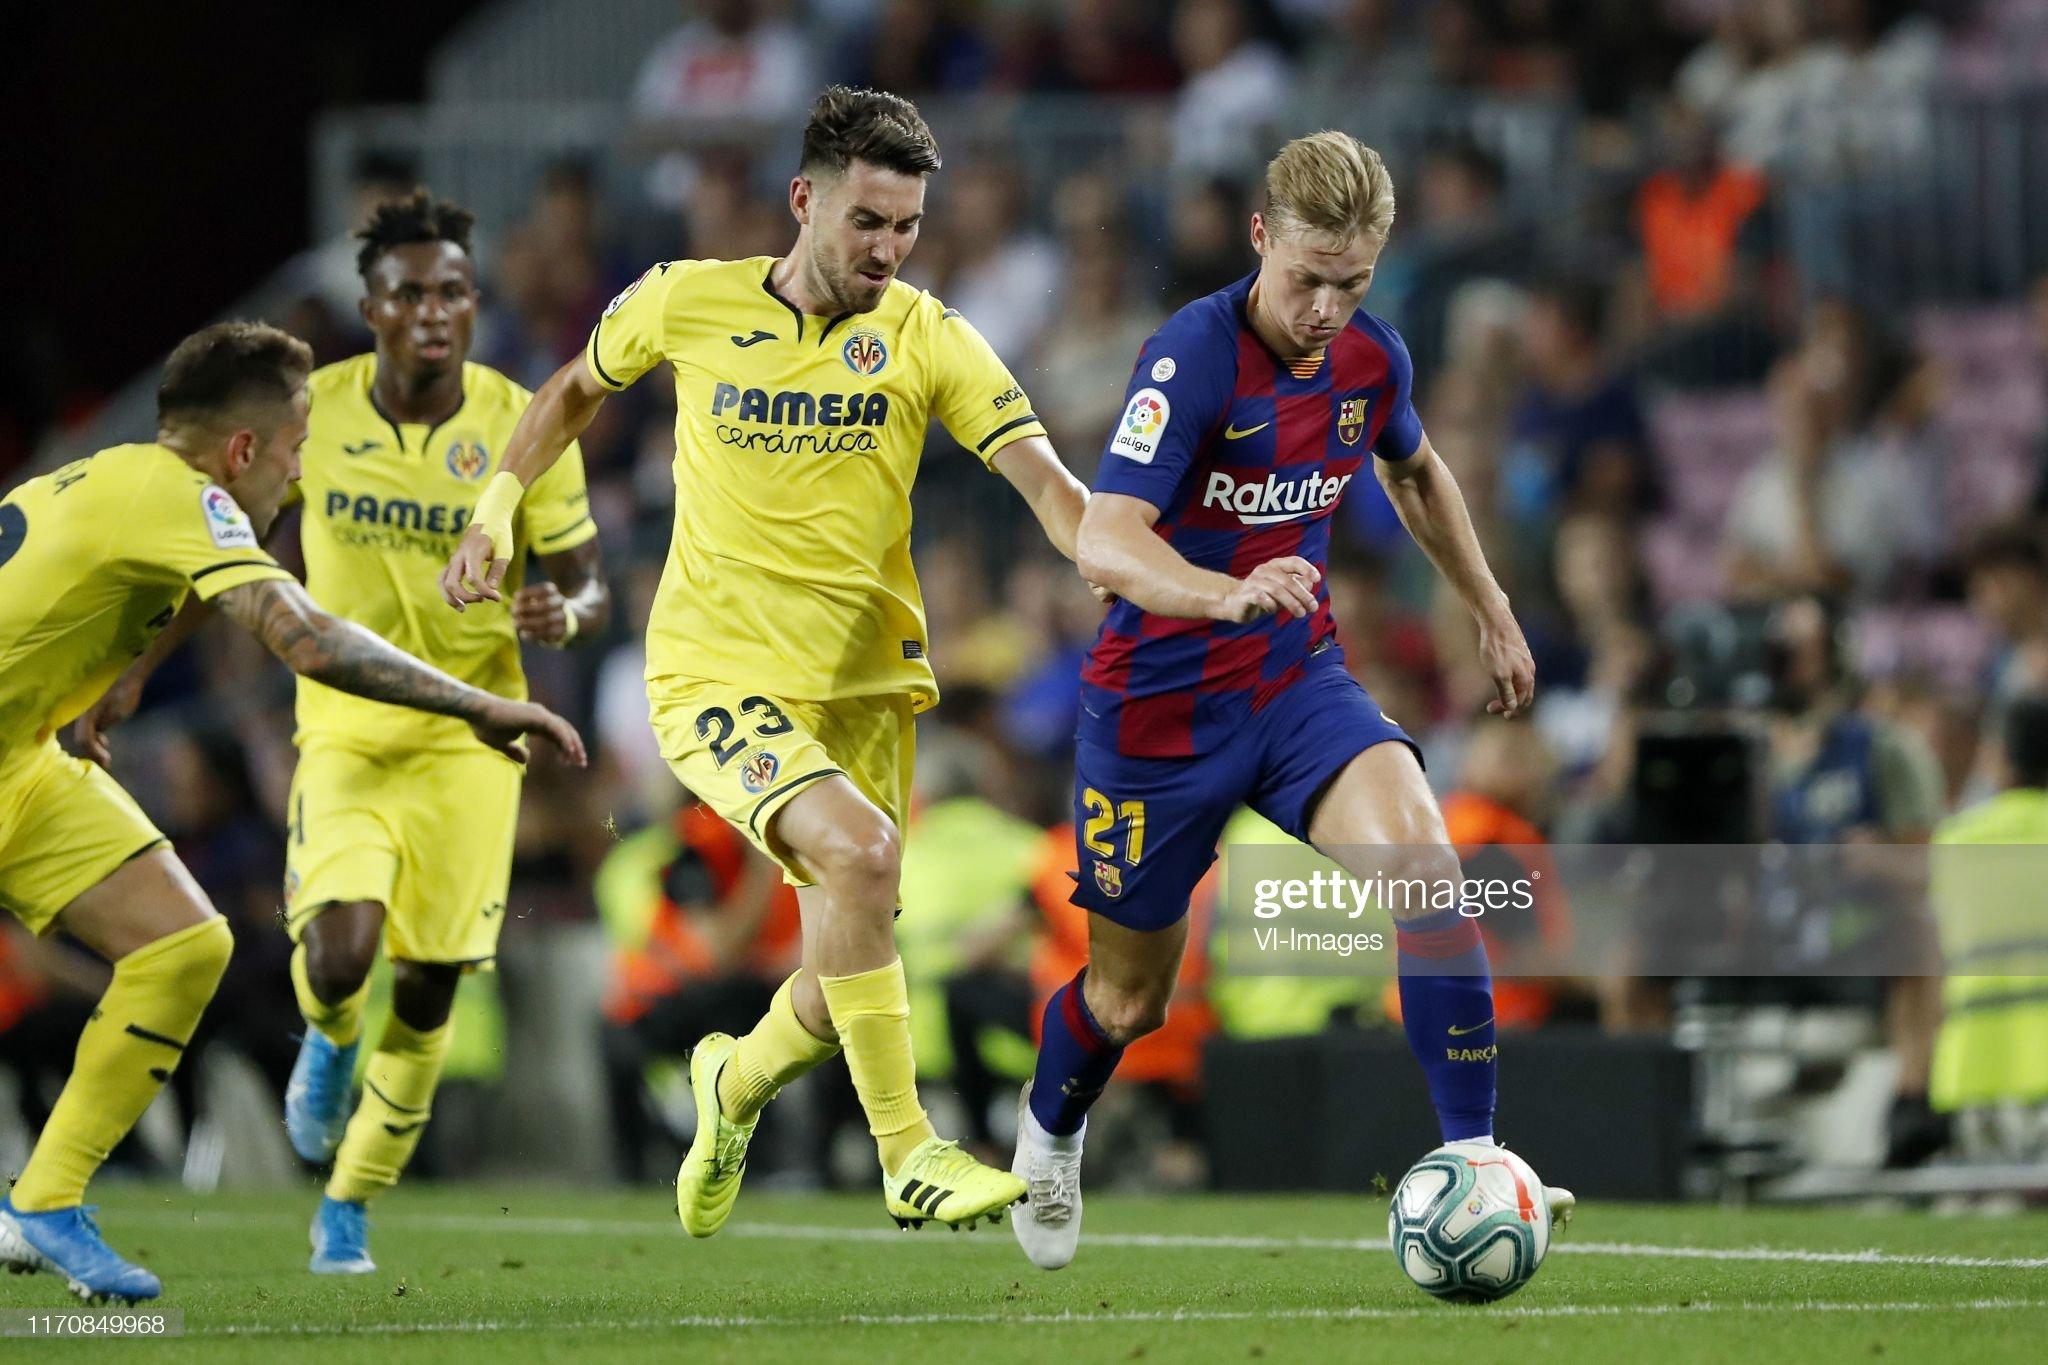 صور مباراة : برشلونة - فياريال 2-1 ( 24-09-2019 )  Ruben-pena-of-villarreal-cf-moi-gomez-of-villarreal-cf-frenkie-de-of-picture-id1170849968?s=2048x2048